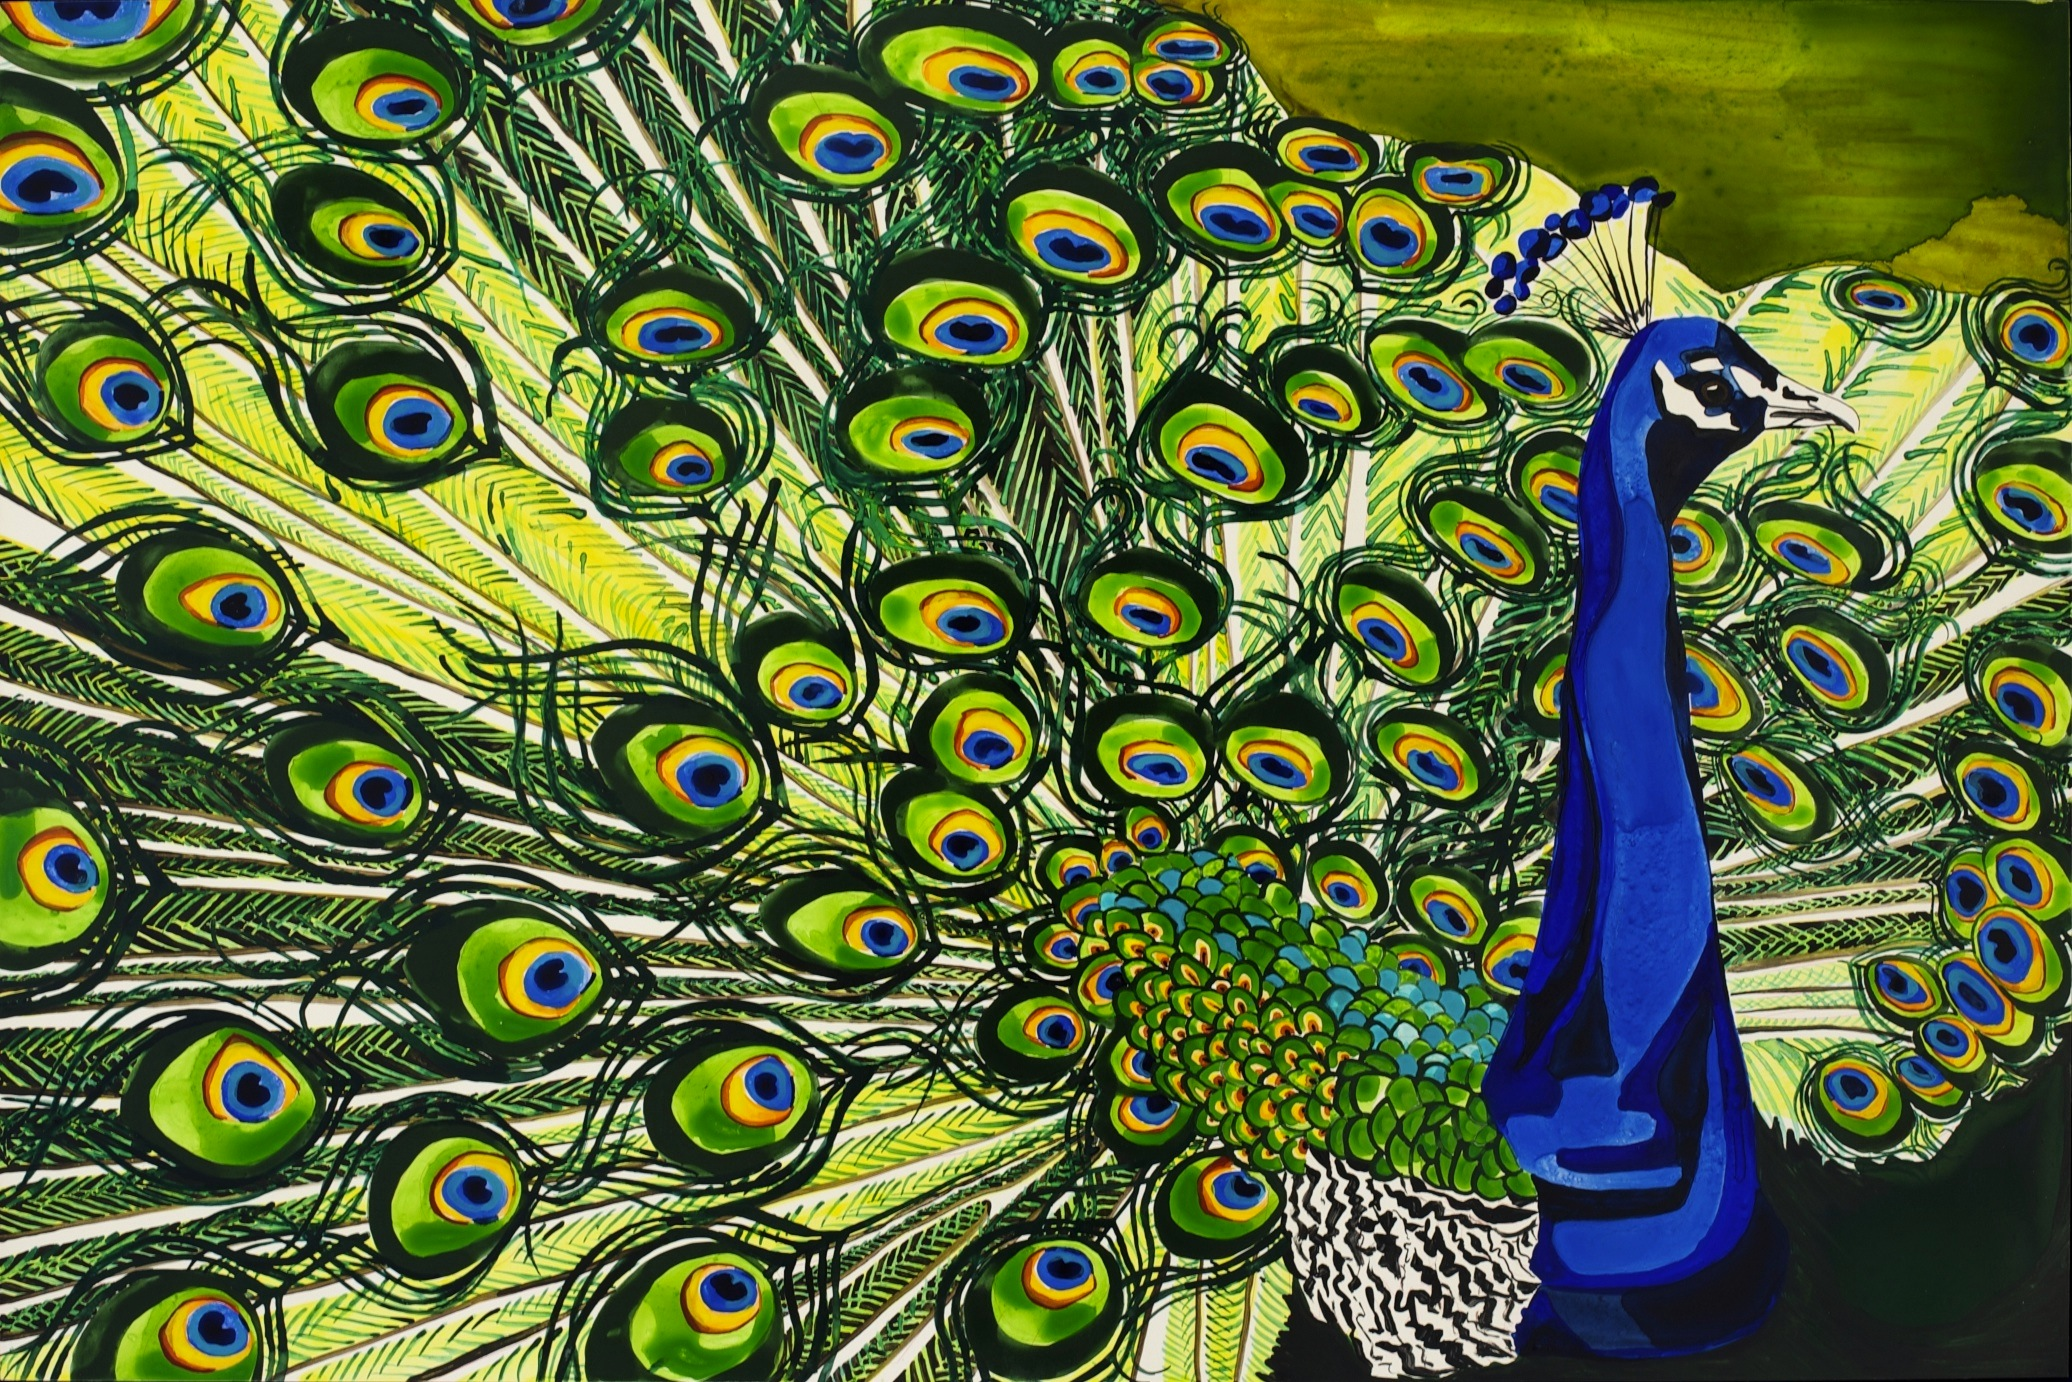 Amedeo peacock.jpg